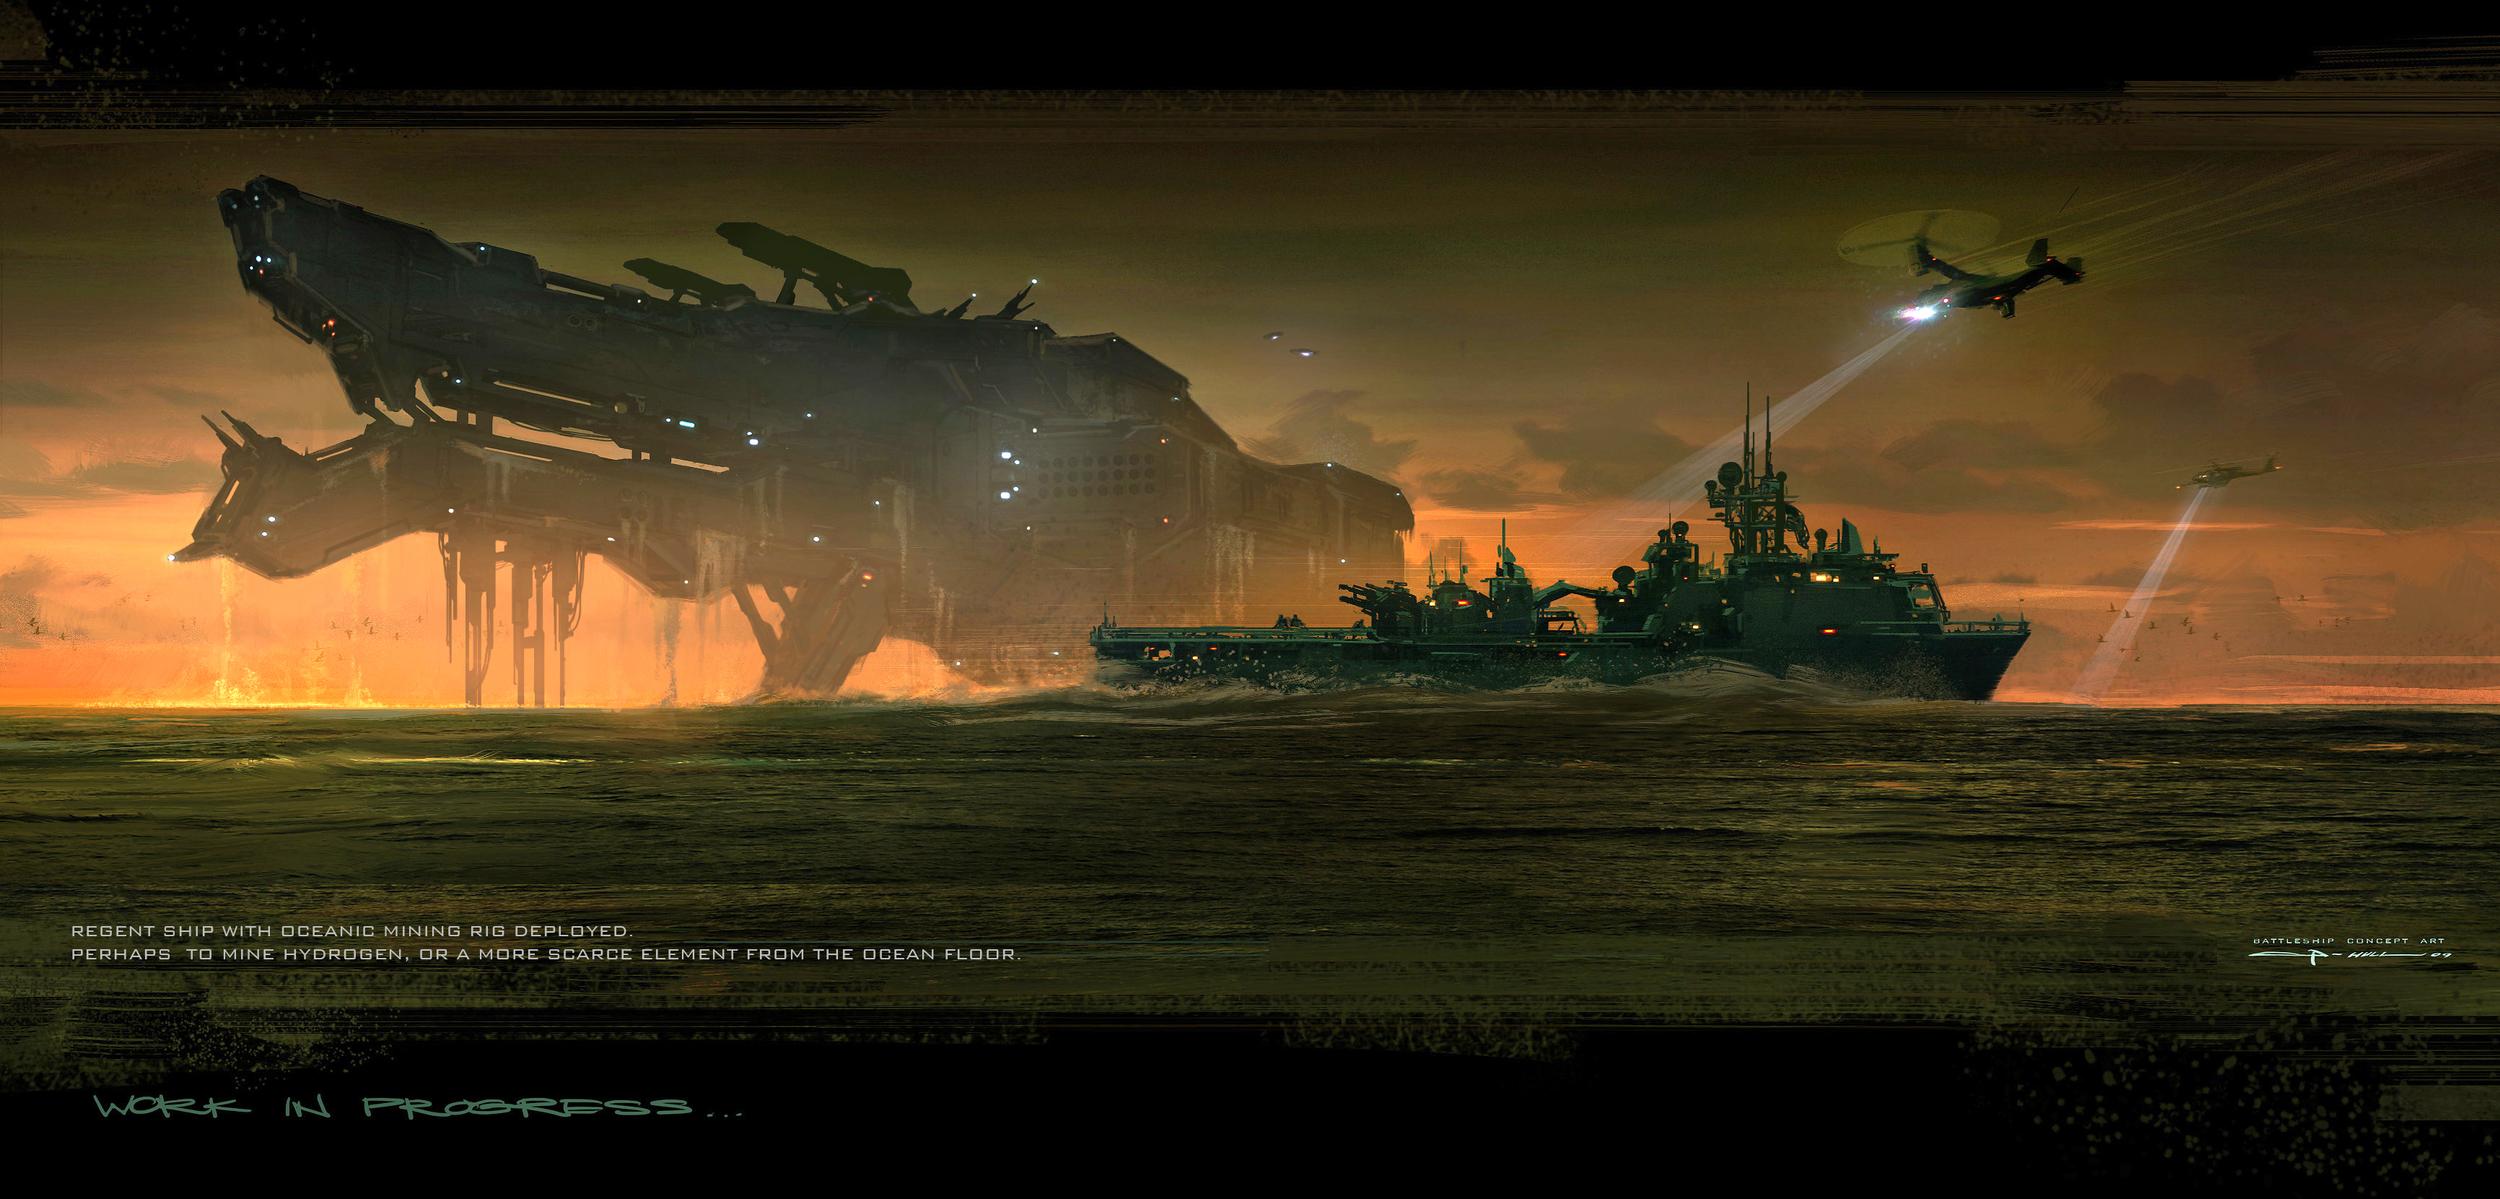 Battleship1_Mothership_sketch1g2_090905_ghull.jpg